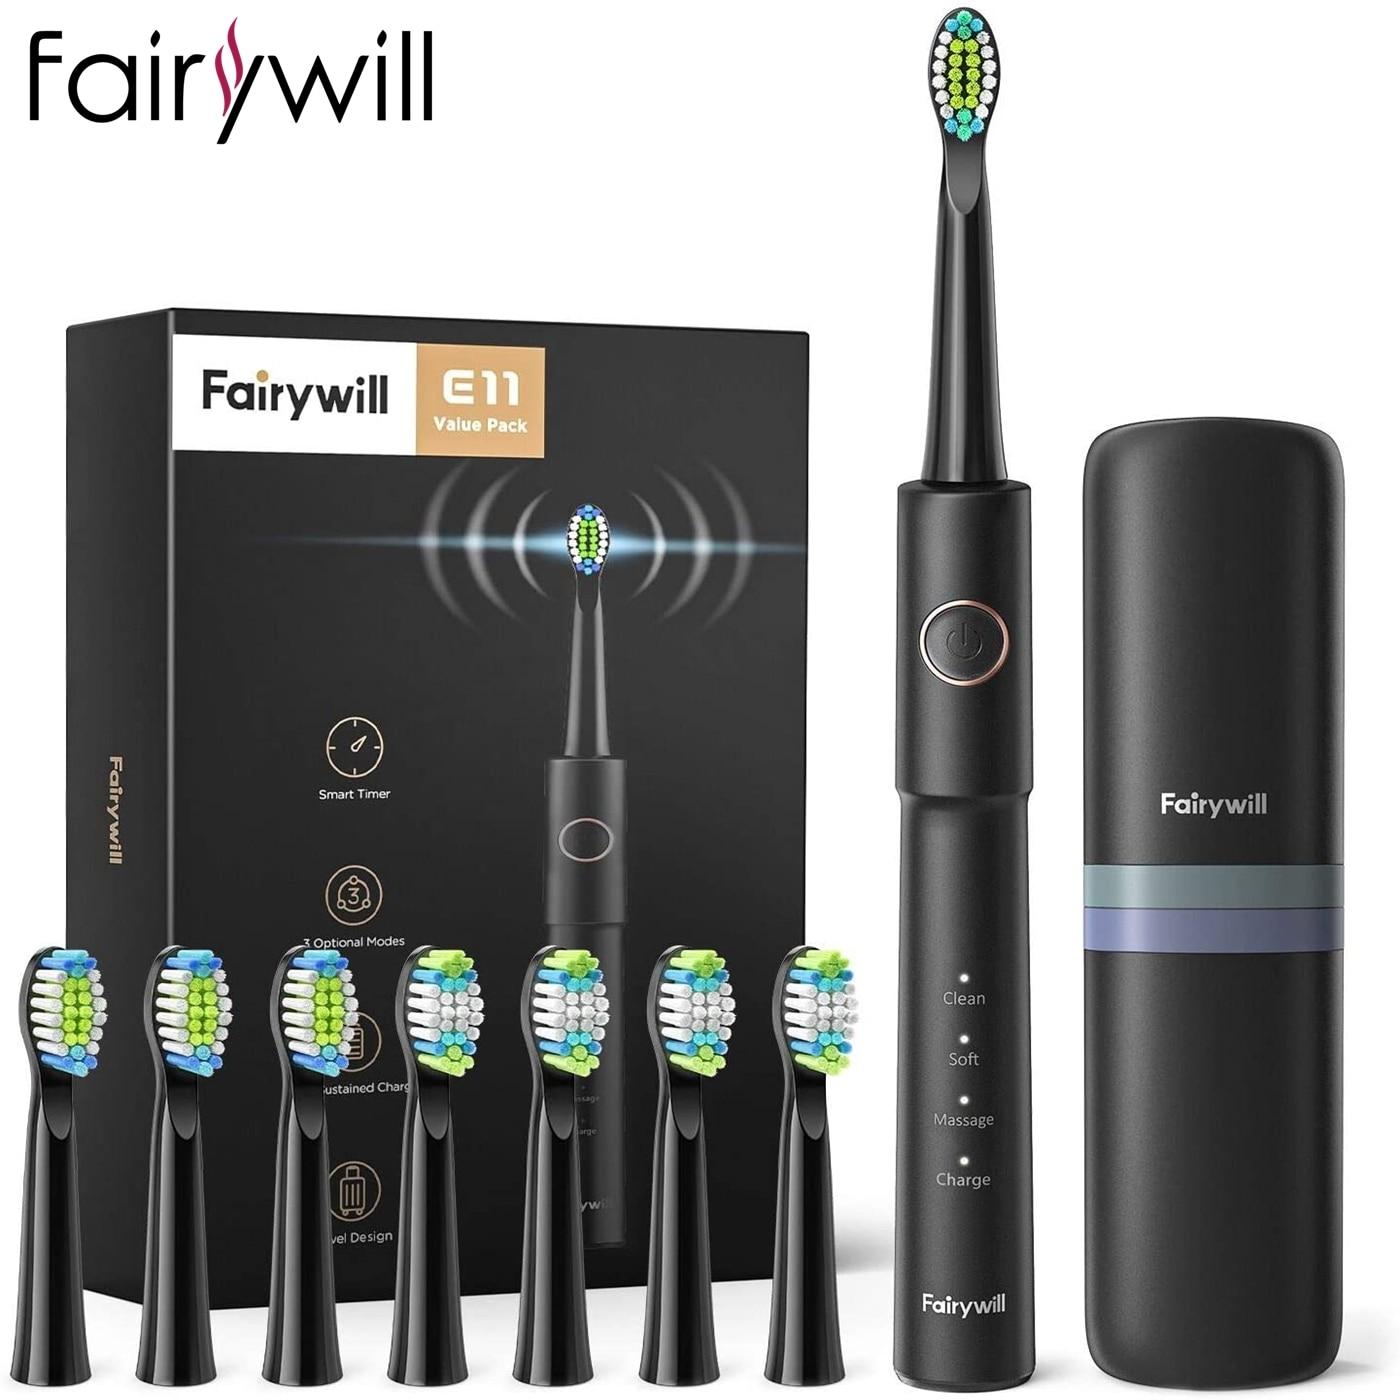 Fairywill فرشاة أسنان كهربائية بالموجات الصوتية E11 للماء USB تهمة فرشاة الأسنان الكهربائية القابلة لإعادة الشحن 8 فرشاة استبدال رؤساء الكبار